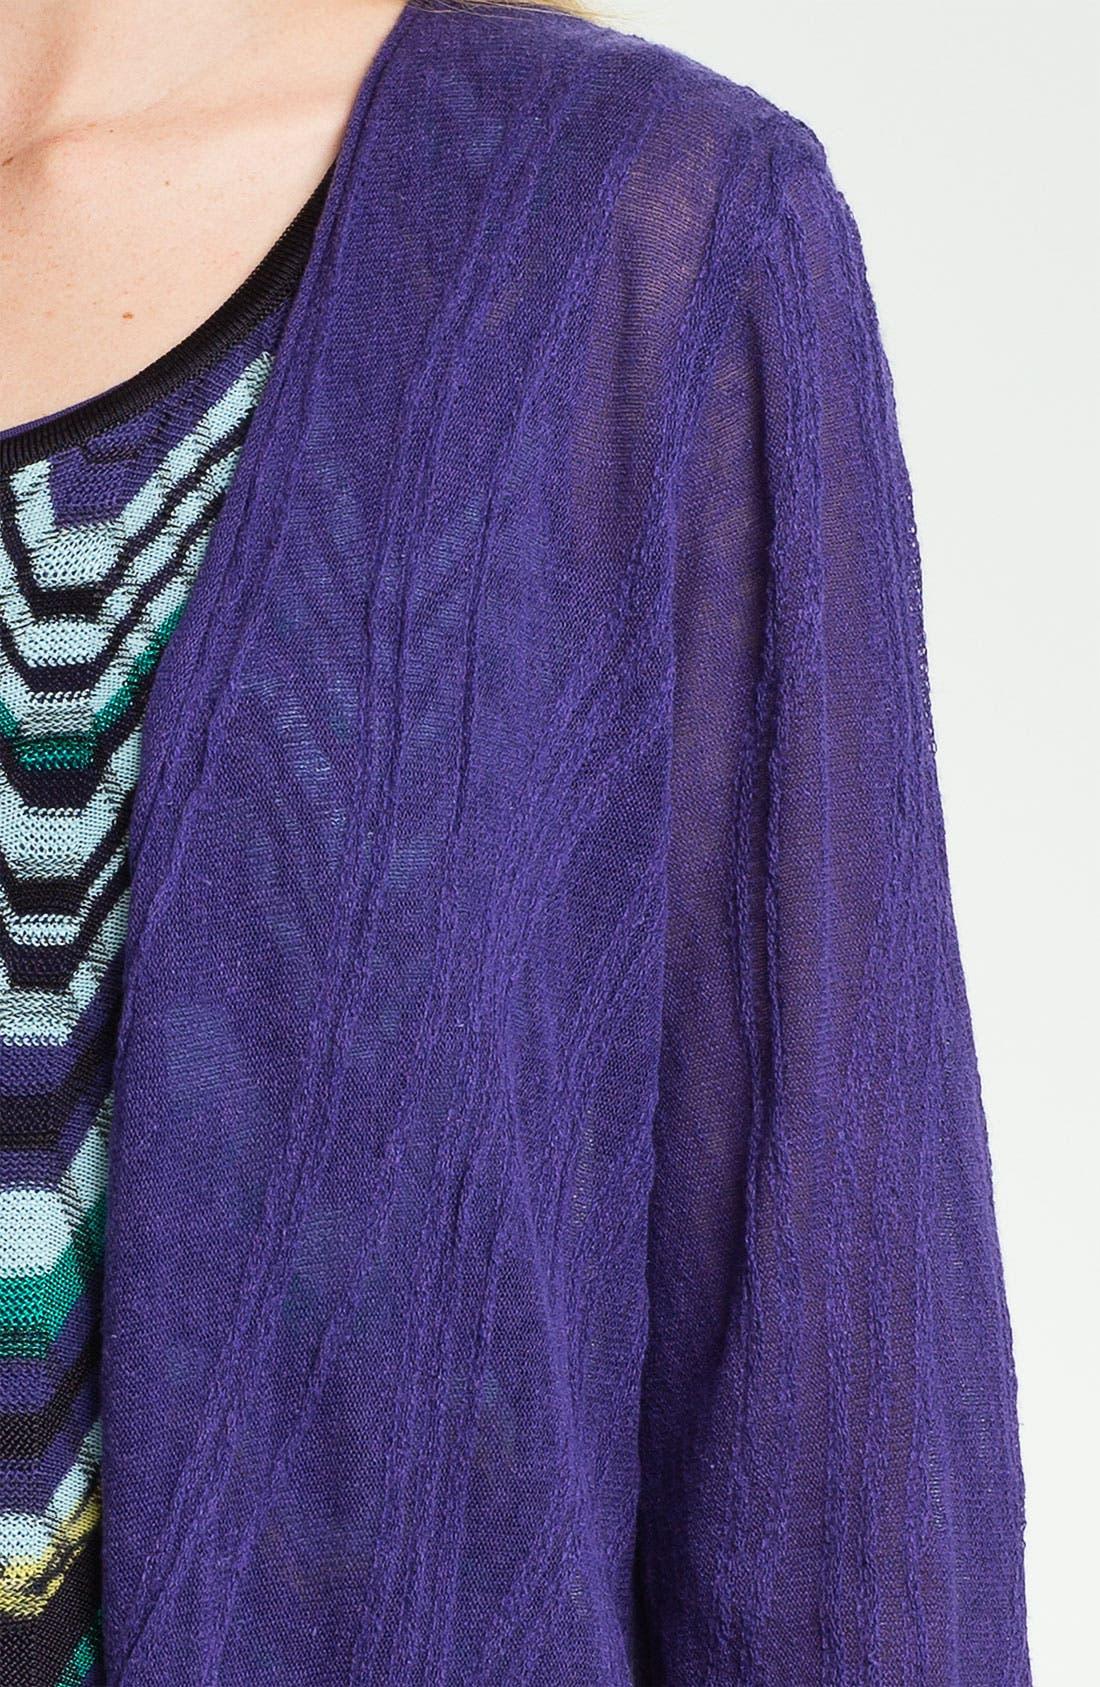 Alternate Image 3  - Nic + Zoe 'Wave' Textured Long Cardigan